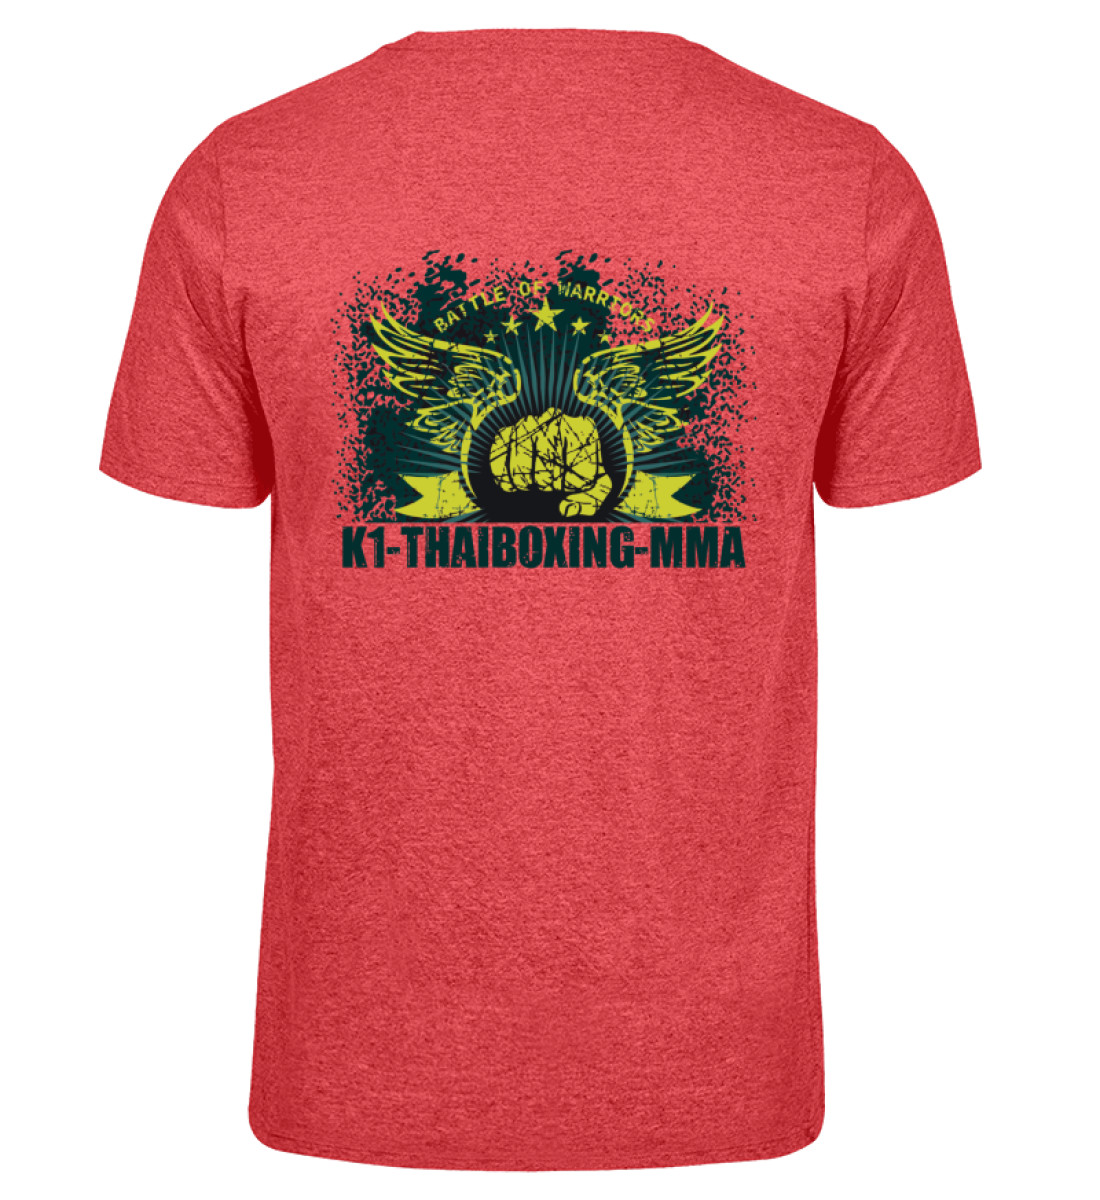 COMA T-Shirt K1-Thaiboxing-MMA - Herren Melange Shirt-6802